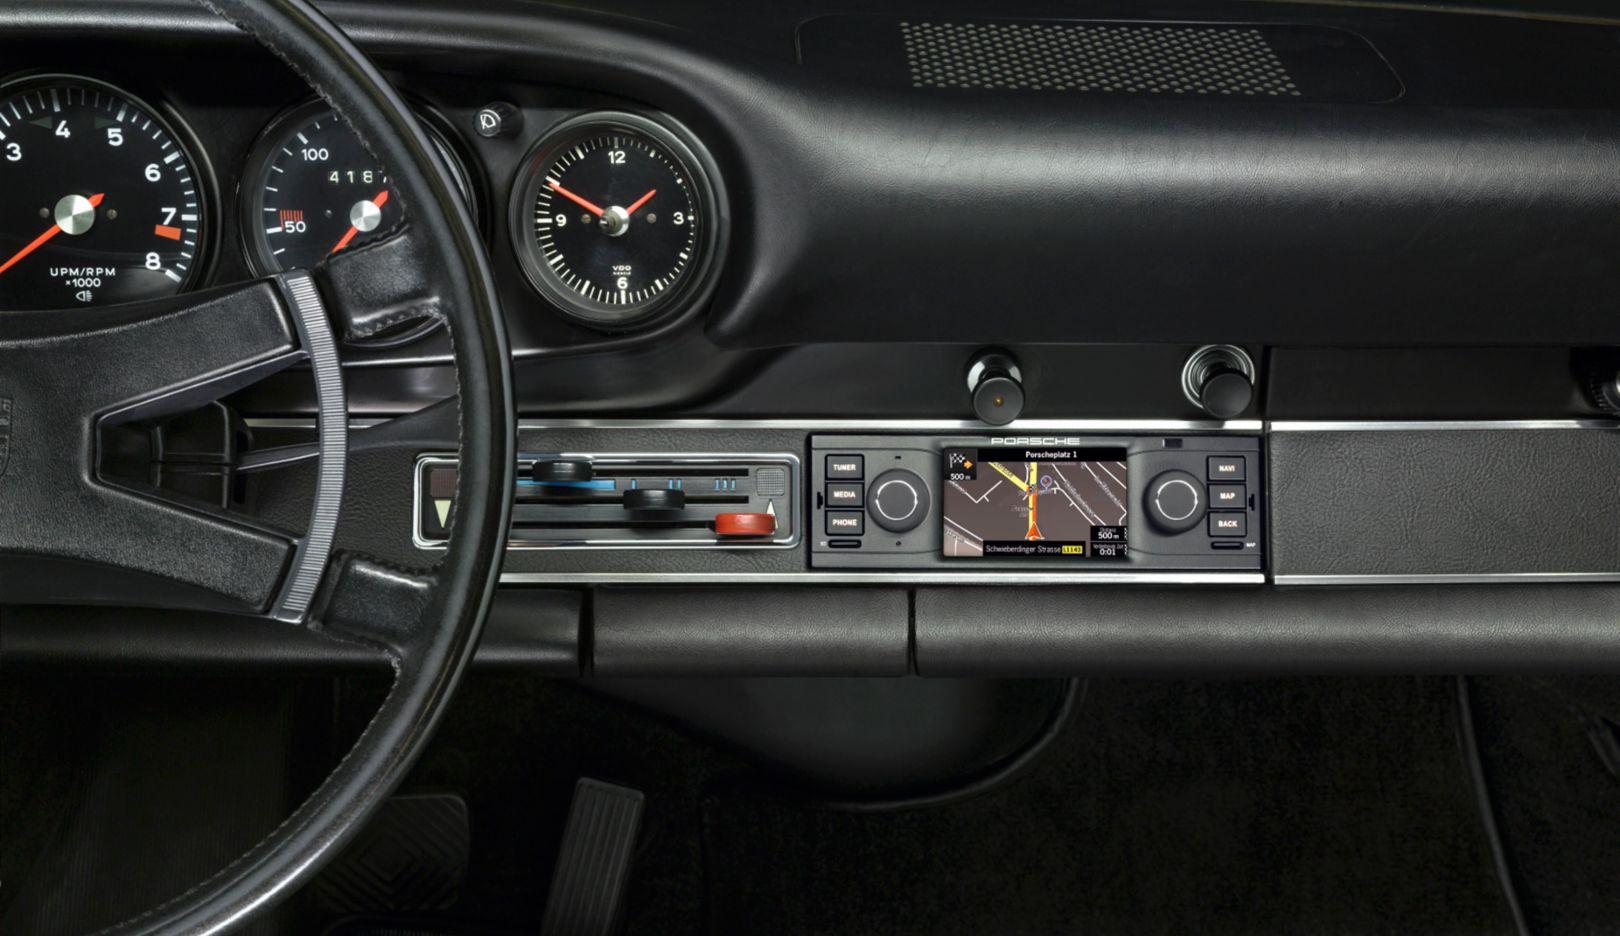 Navigationsradio, Porsche Classic, 2015, Porsche AG